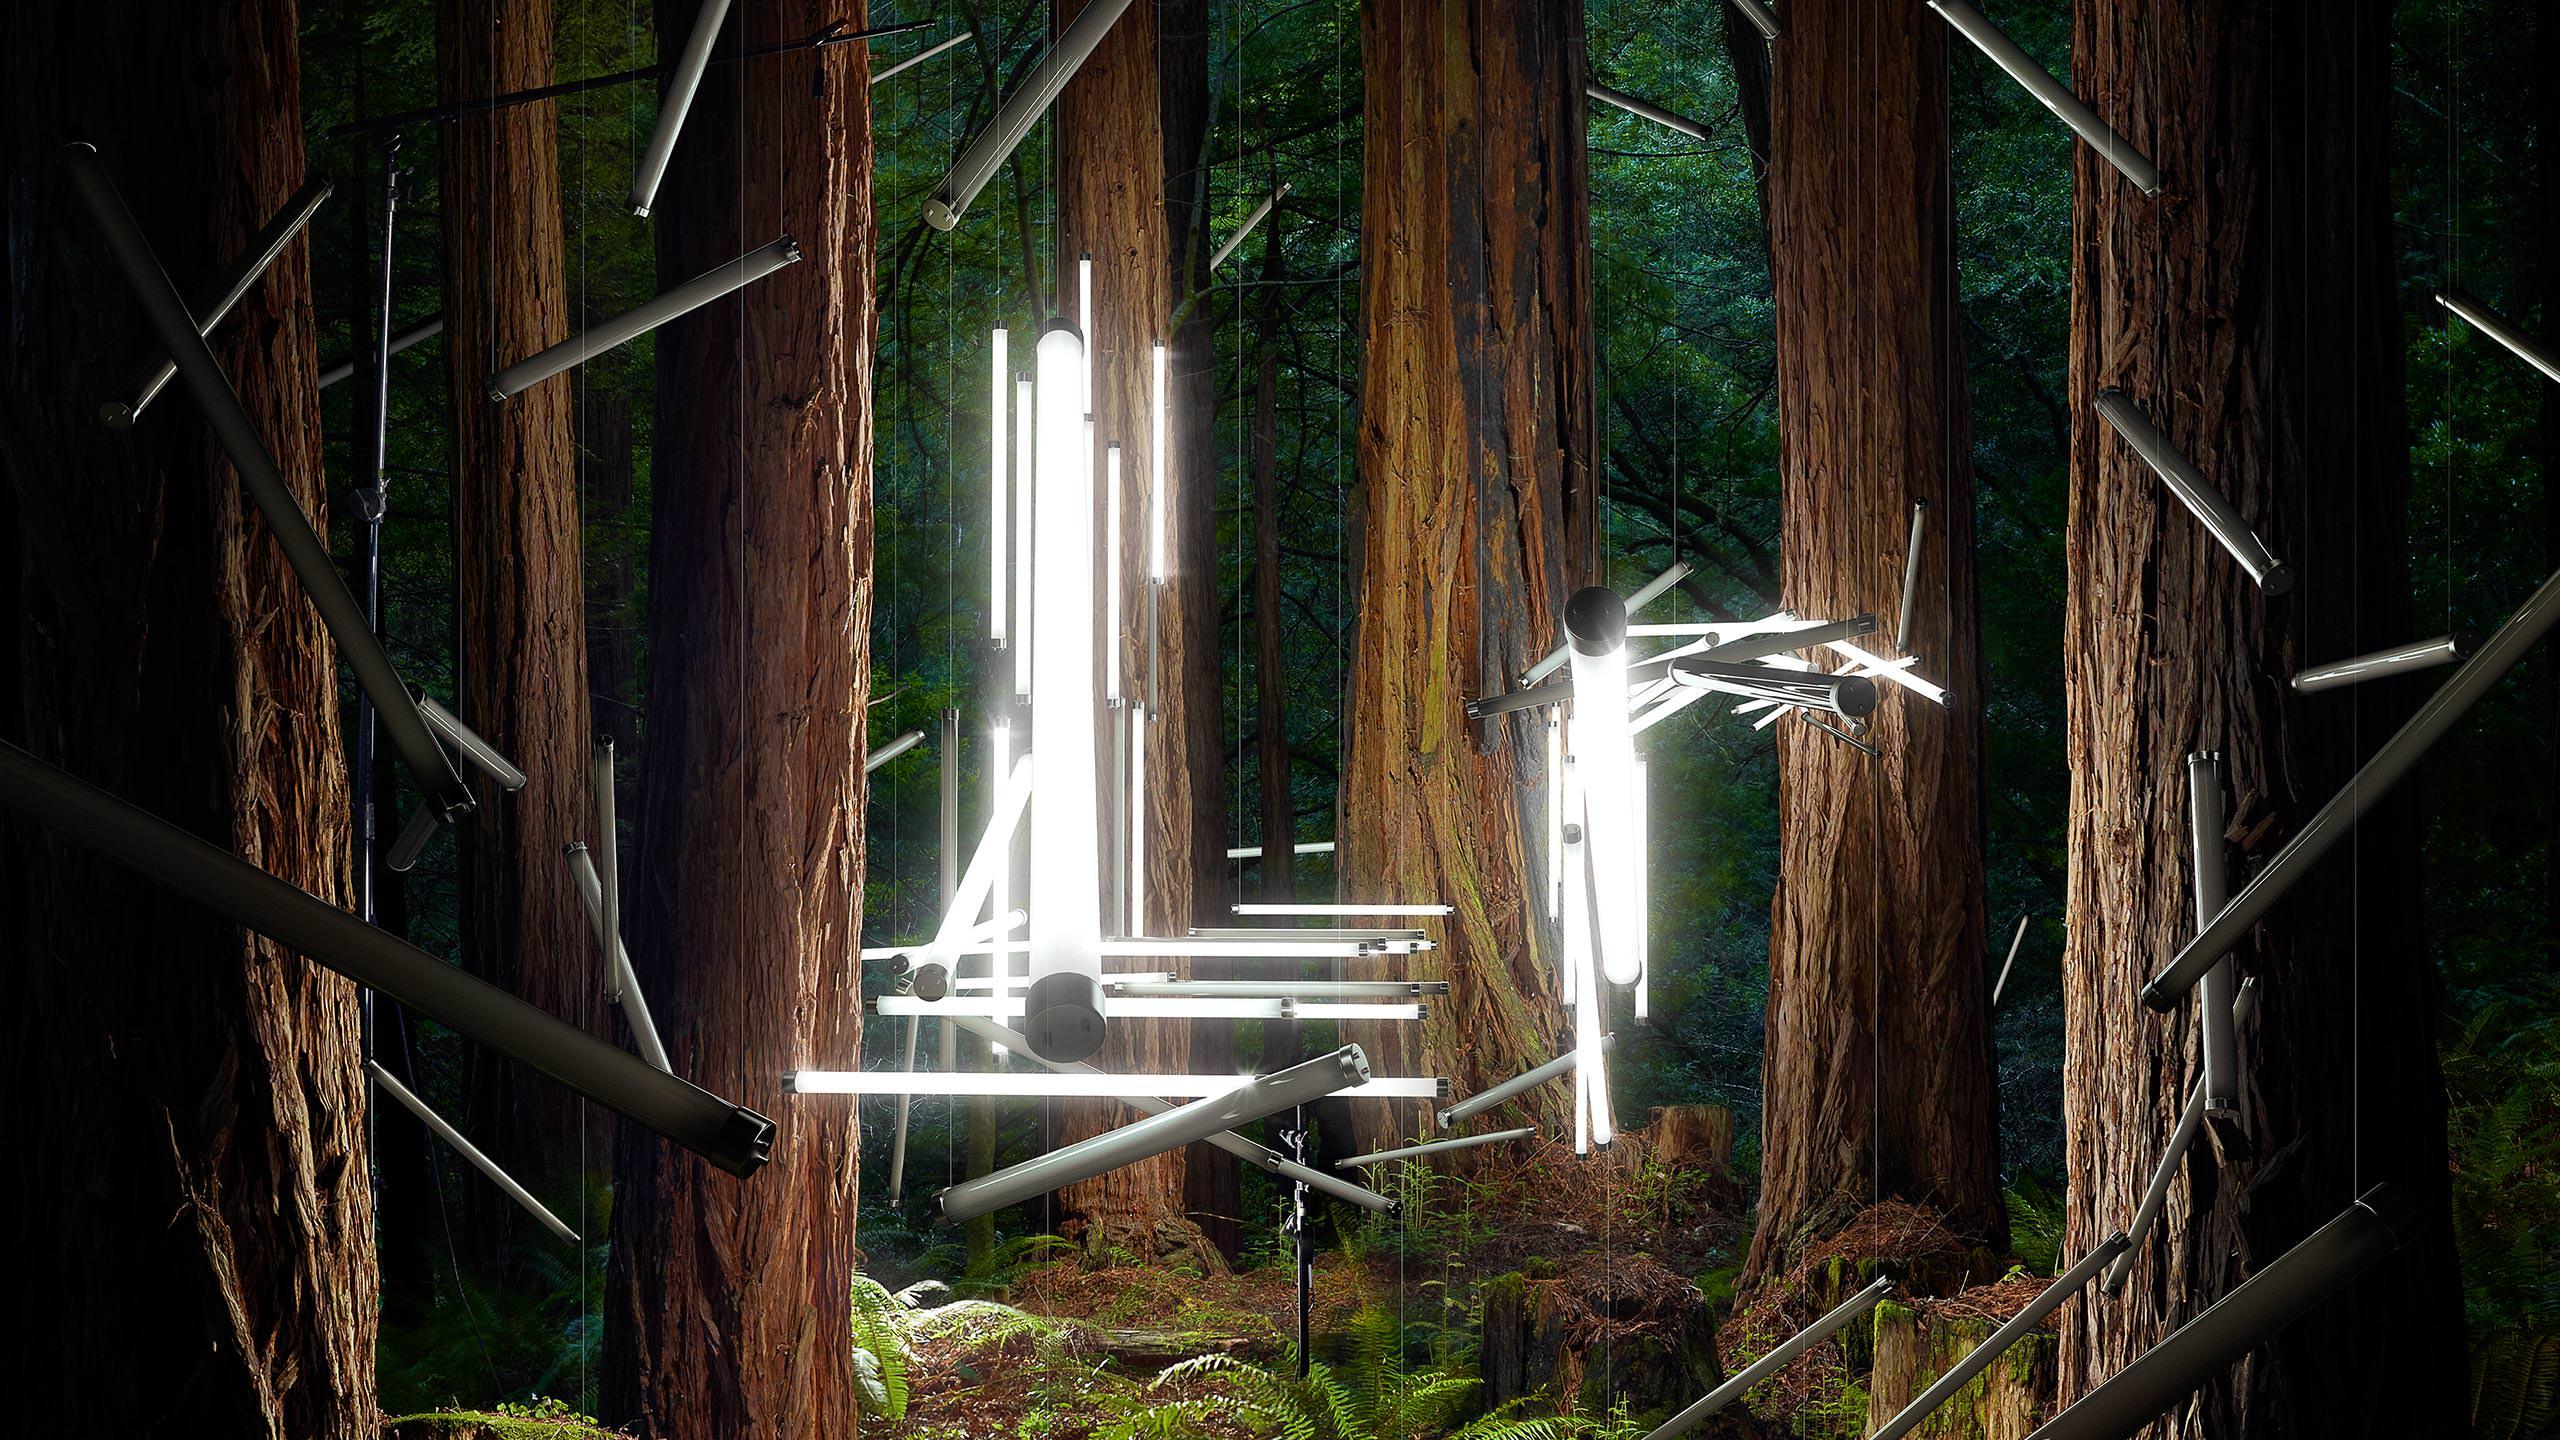 Adobe Photo Shoot - LIghtroom